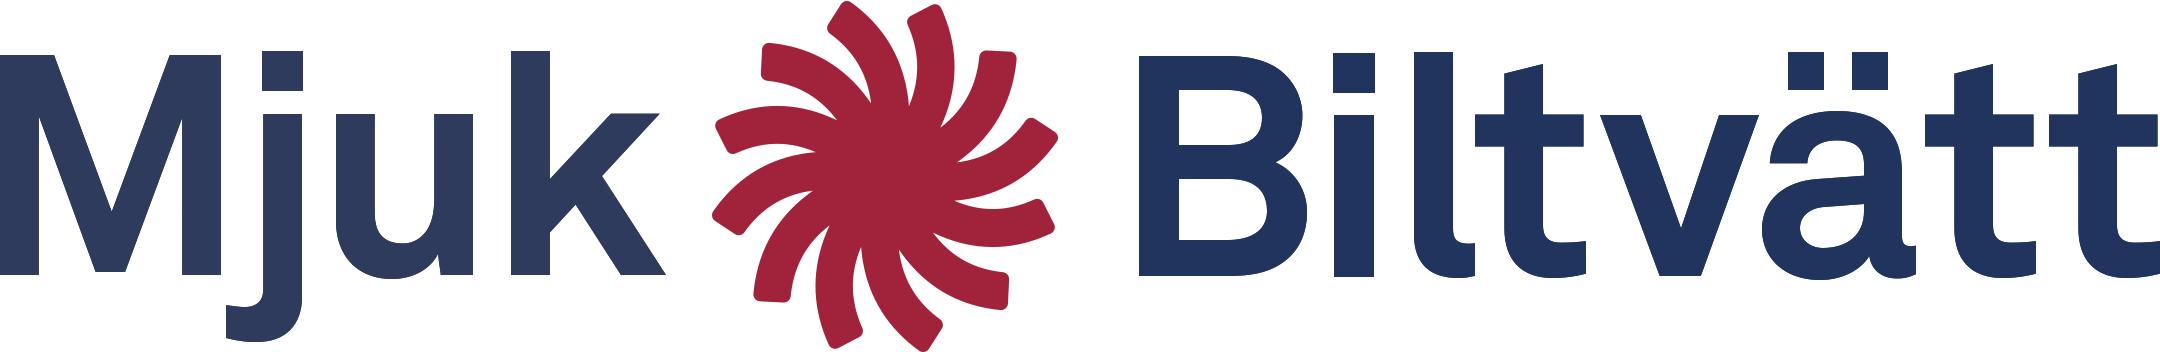 Mjuk Biltvätt, logotyp 2018_liten.png